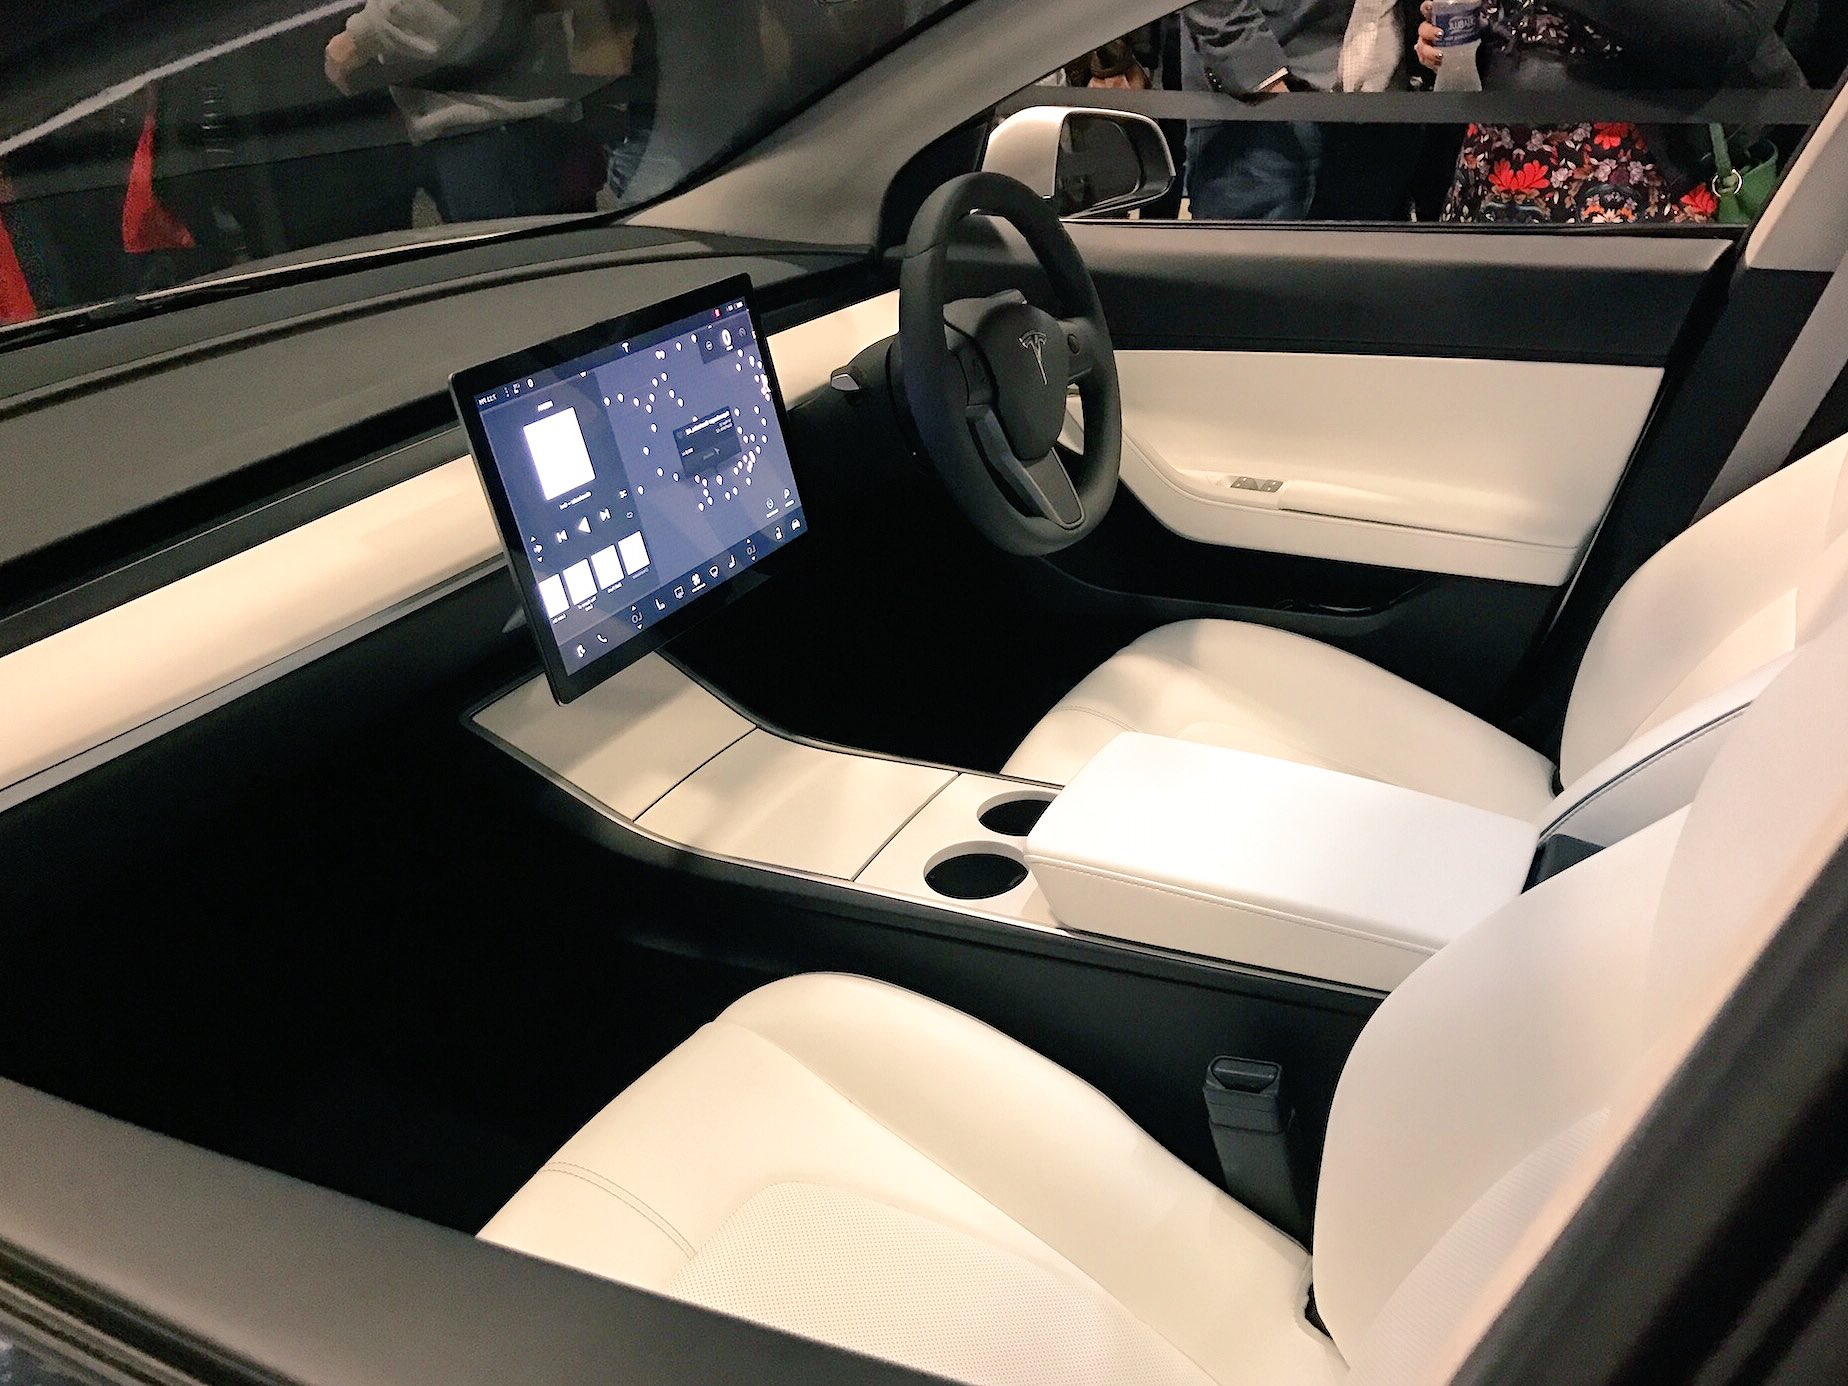 5c7359989d Elon Musk  Tesla could make RHD Model 3  probably mid-next year